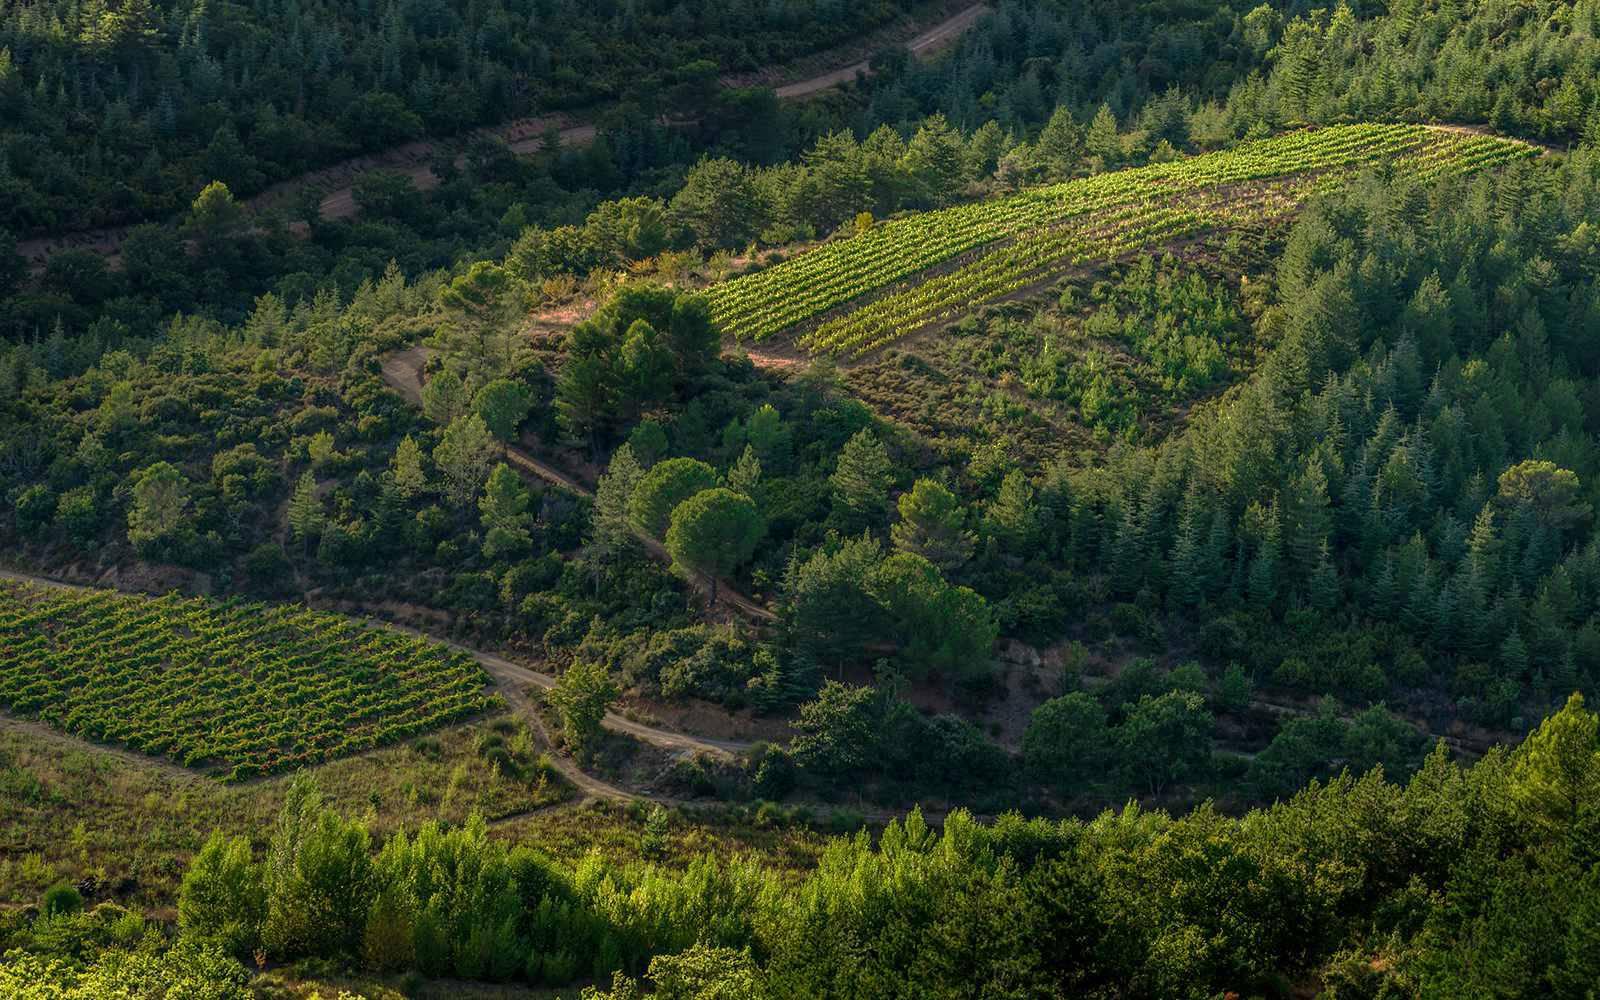 How environmentally friendly is Le Grand Noir?